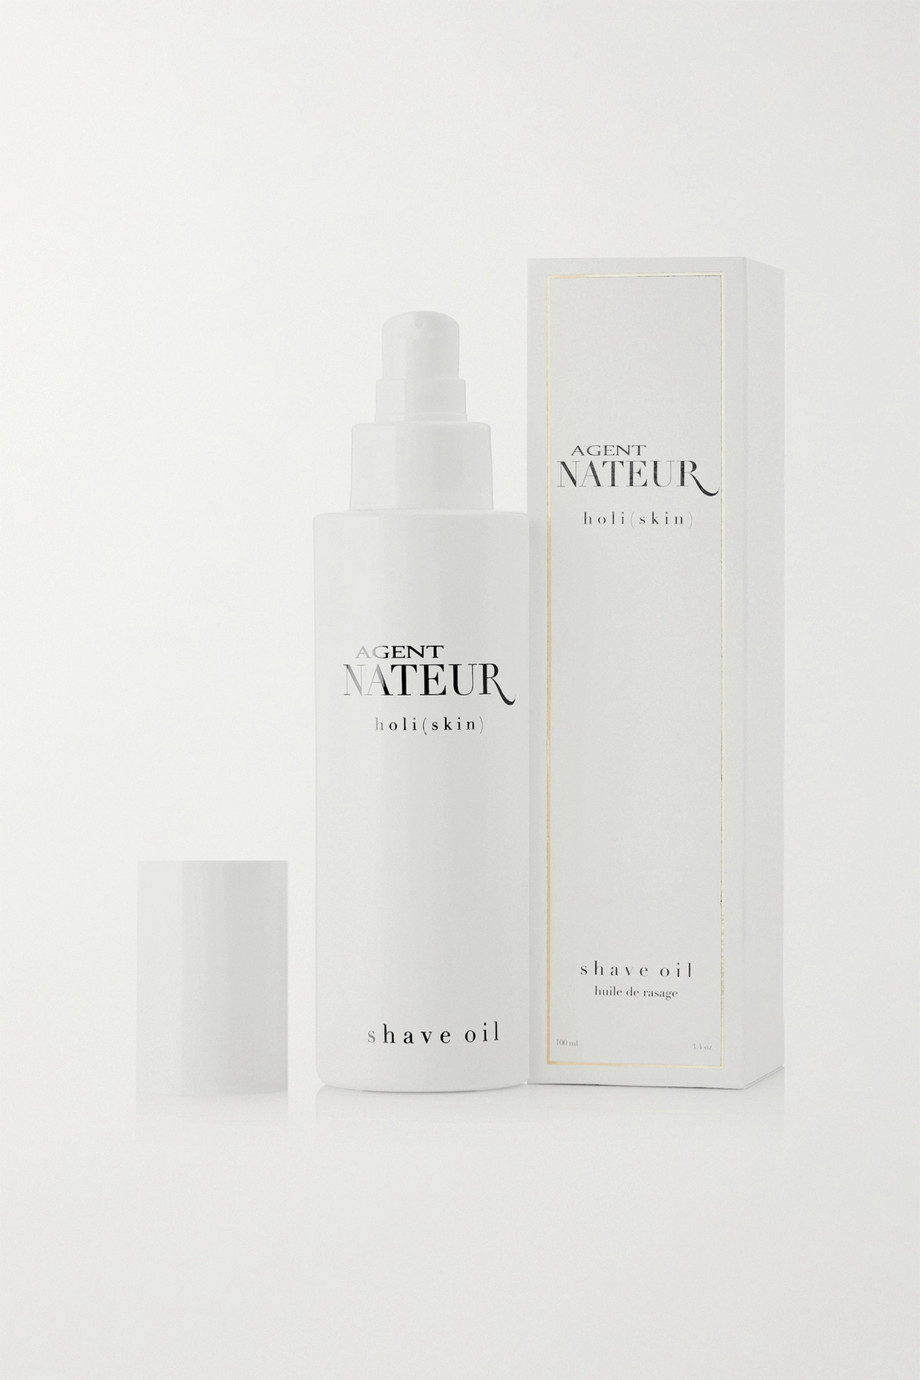 Agent Nateur holi(skin) Shave Oil, 100ml